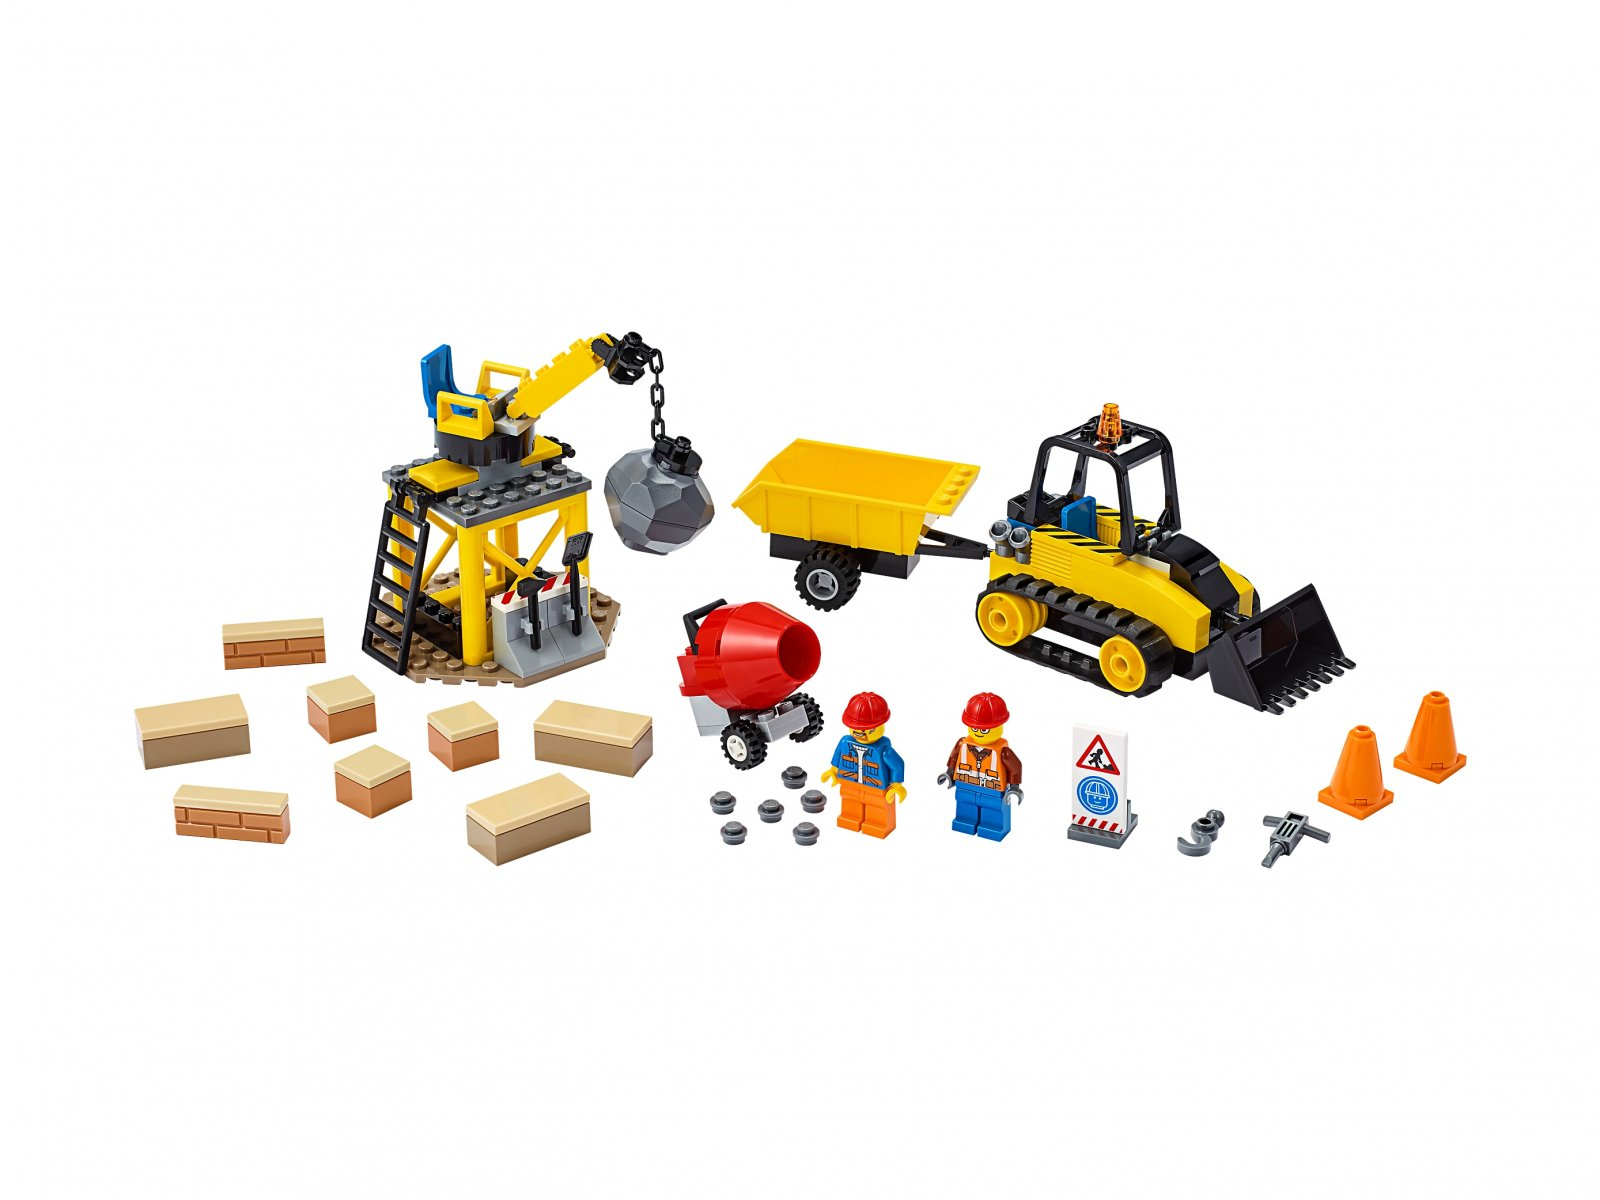 LEGO 60252 Buldożer budowlany